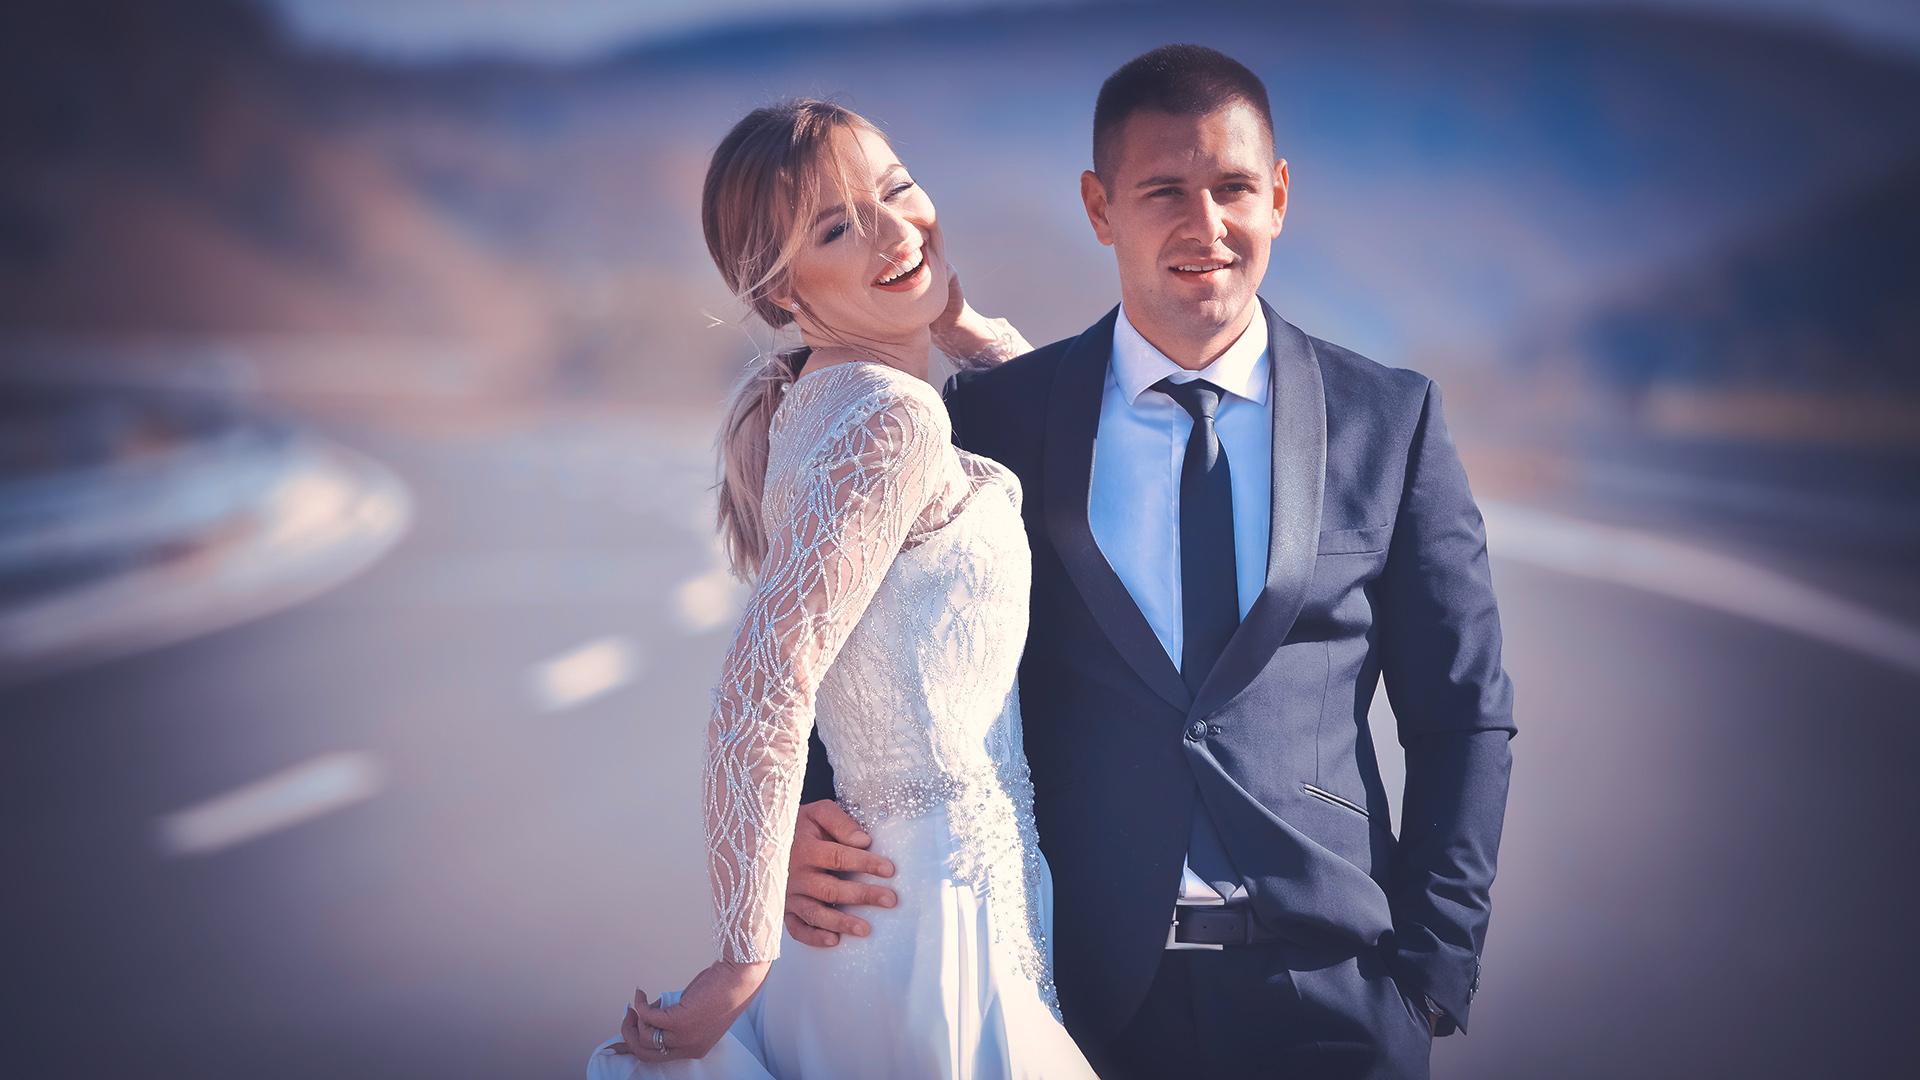 Fotografisanje-vencanja-Wedding-Photography-Hochzeitsfotografie-12